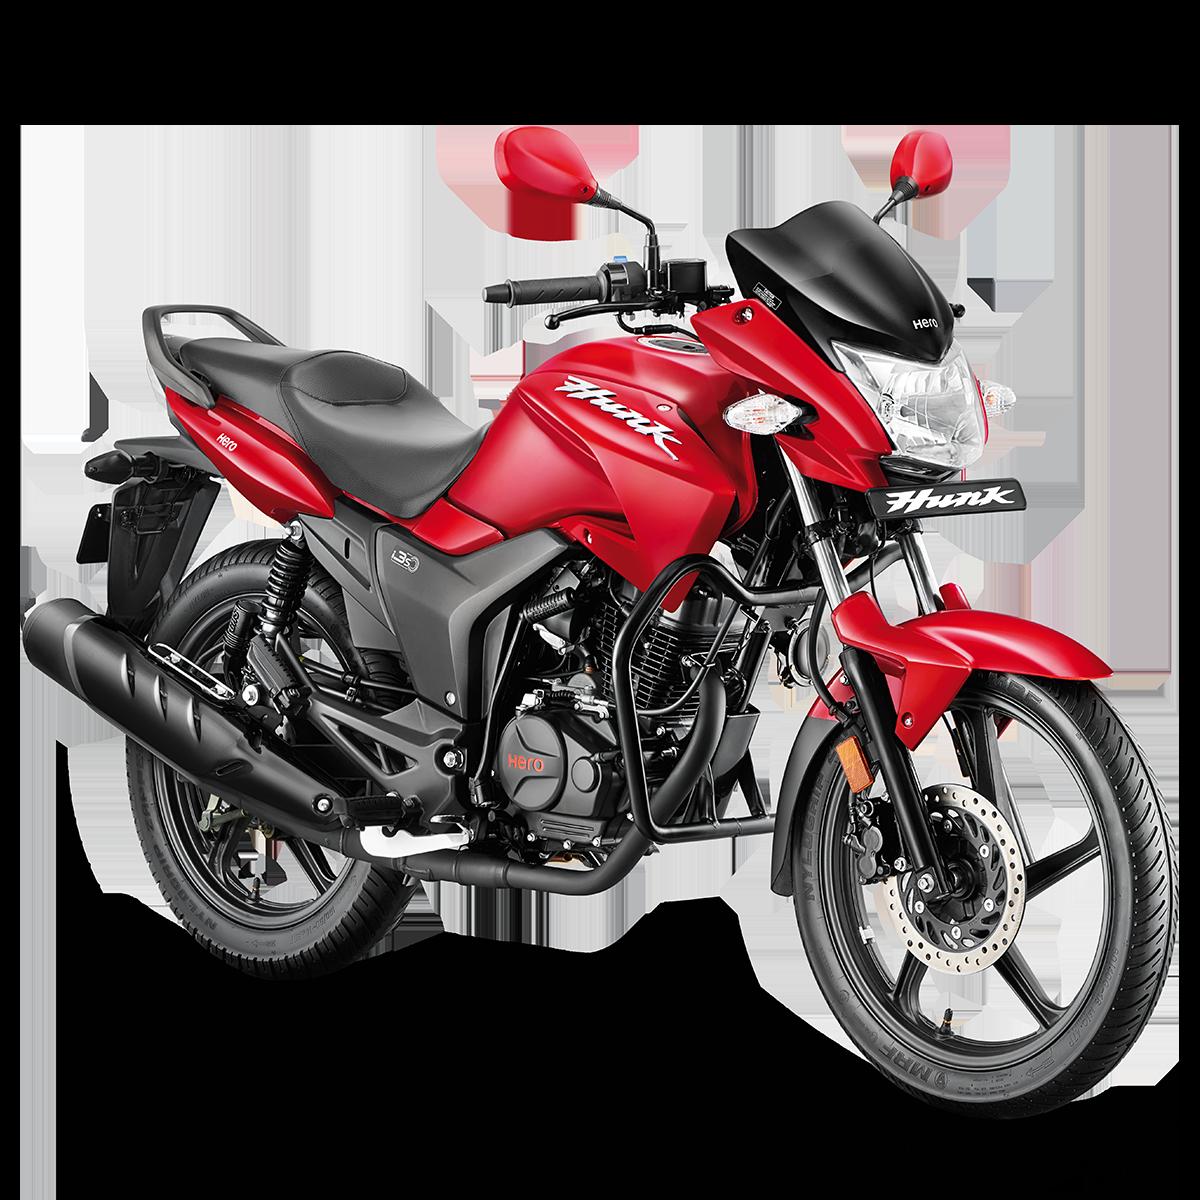 HUNK i3S - Motor: 150cc / Potencia: 15.8 BHPPrecio: Q13,600.00 / Cuota: Q562.50